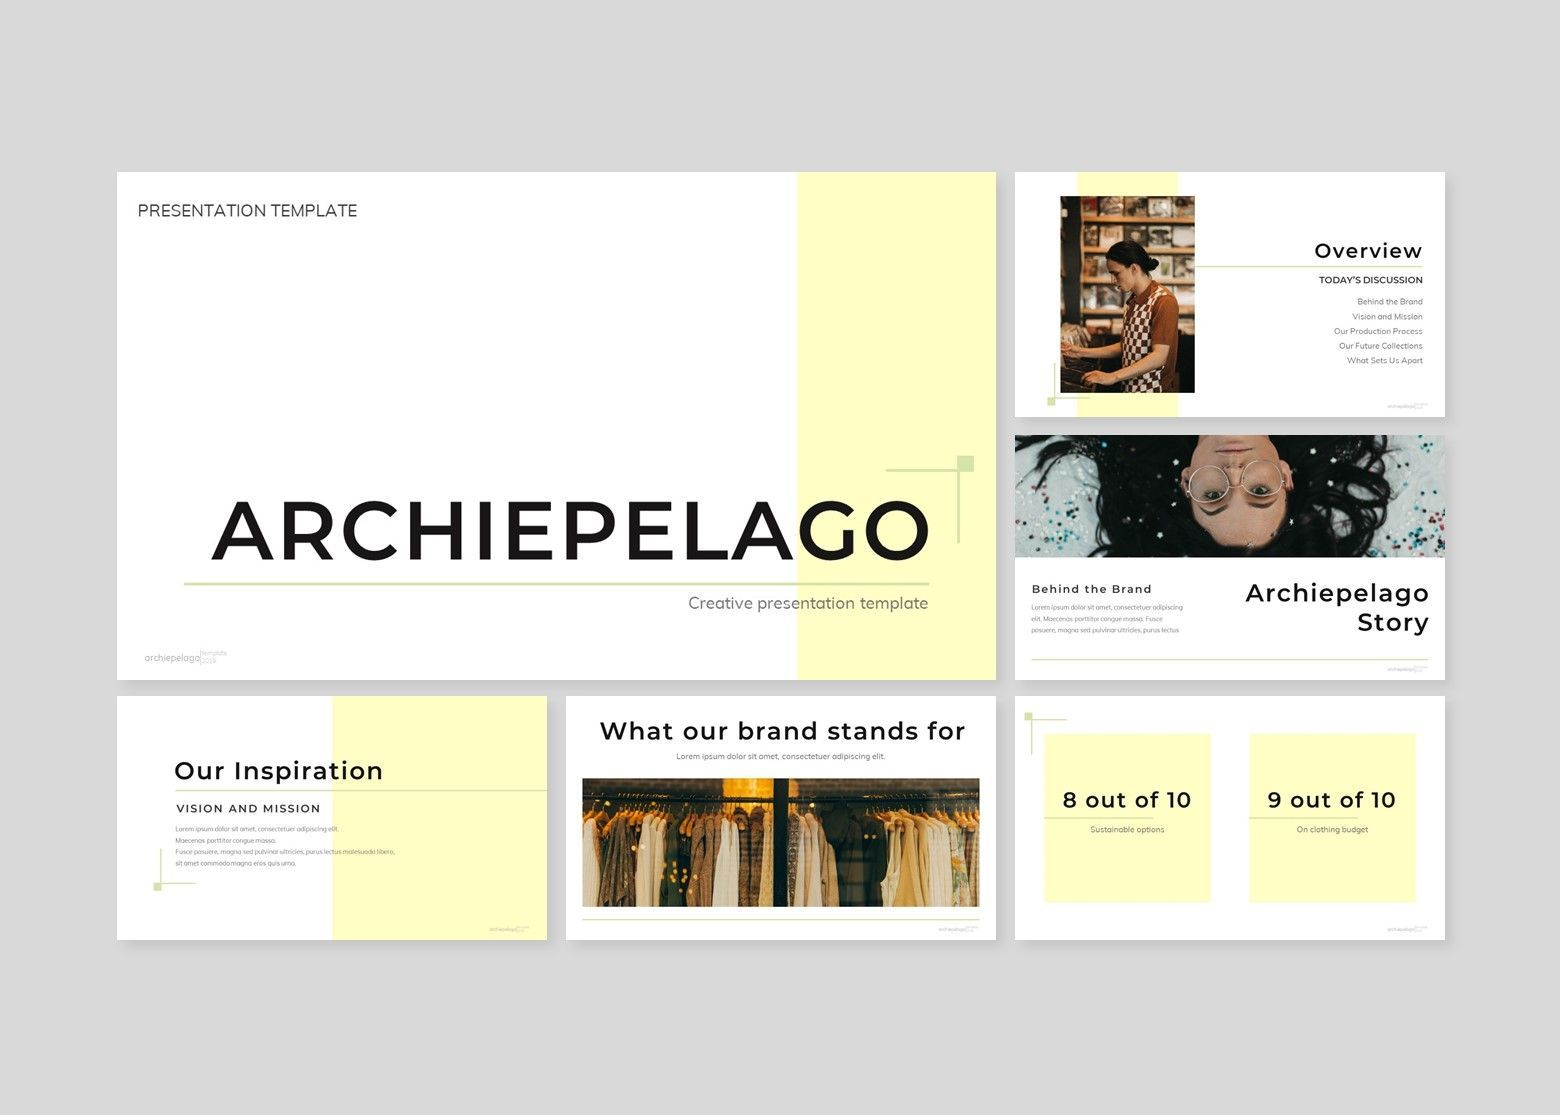 Archiepelago - Powerpoint Template, Slide 2, 07697, Presentation Templates — PoweredTemplate.com